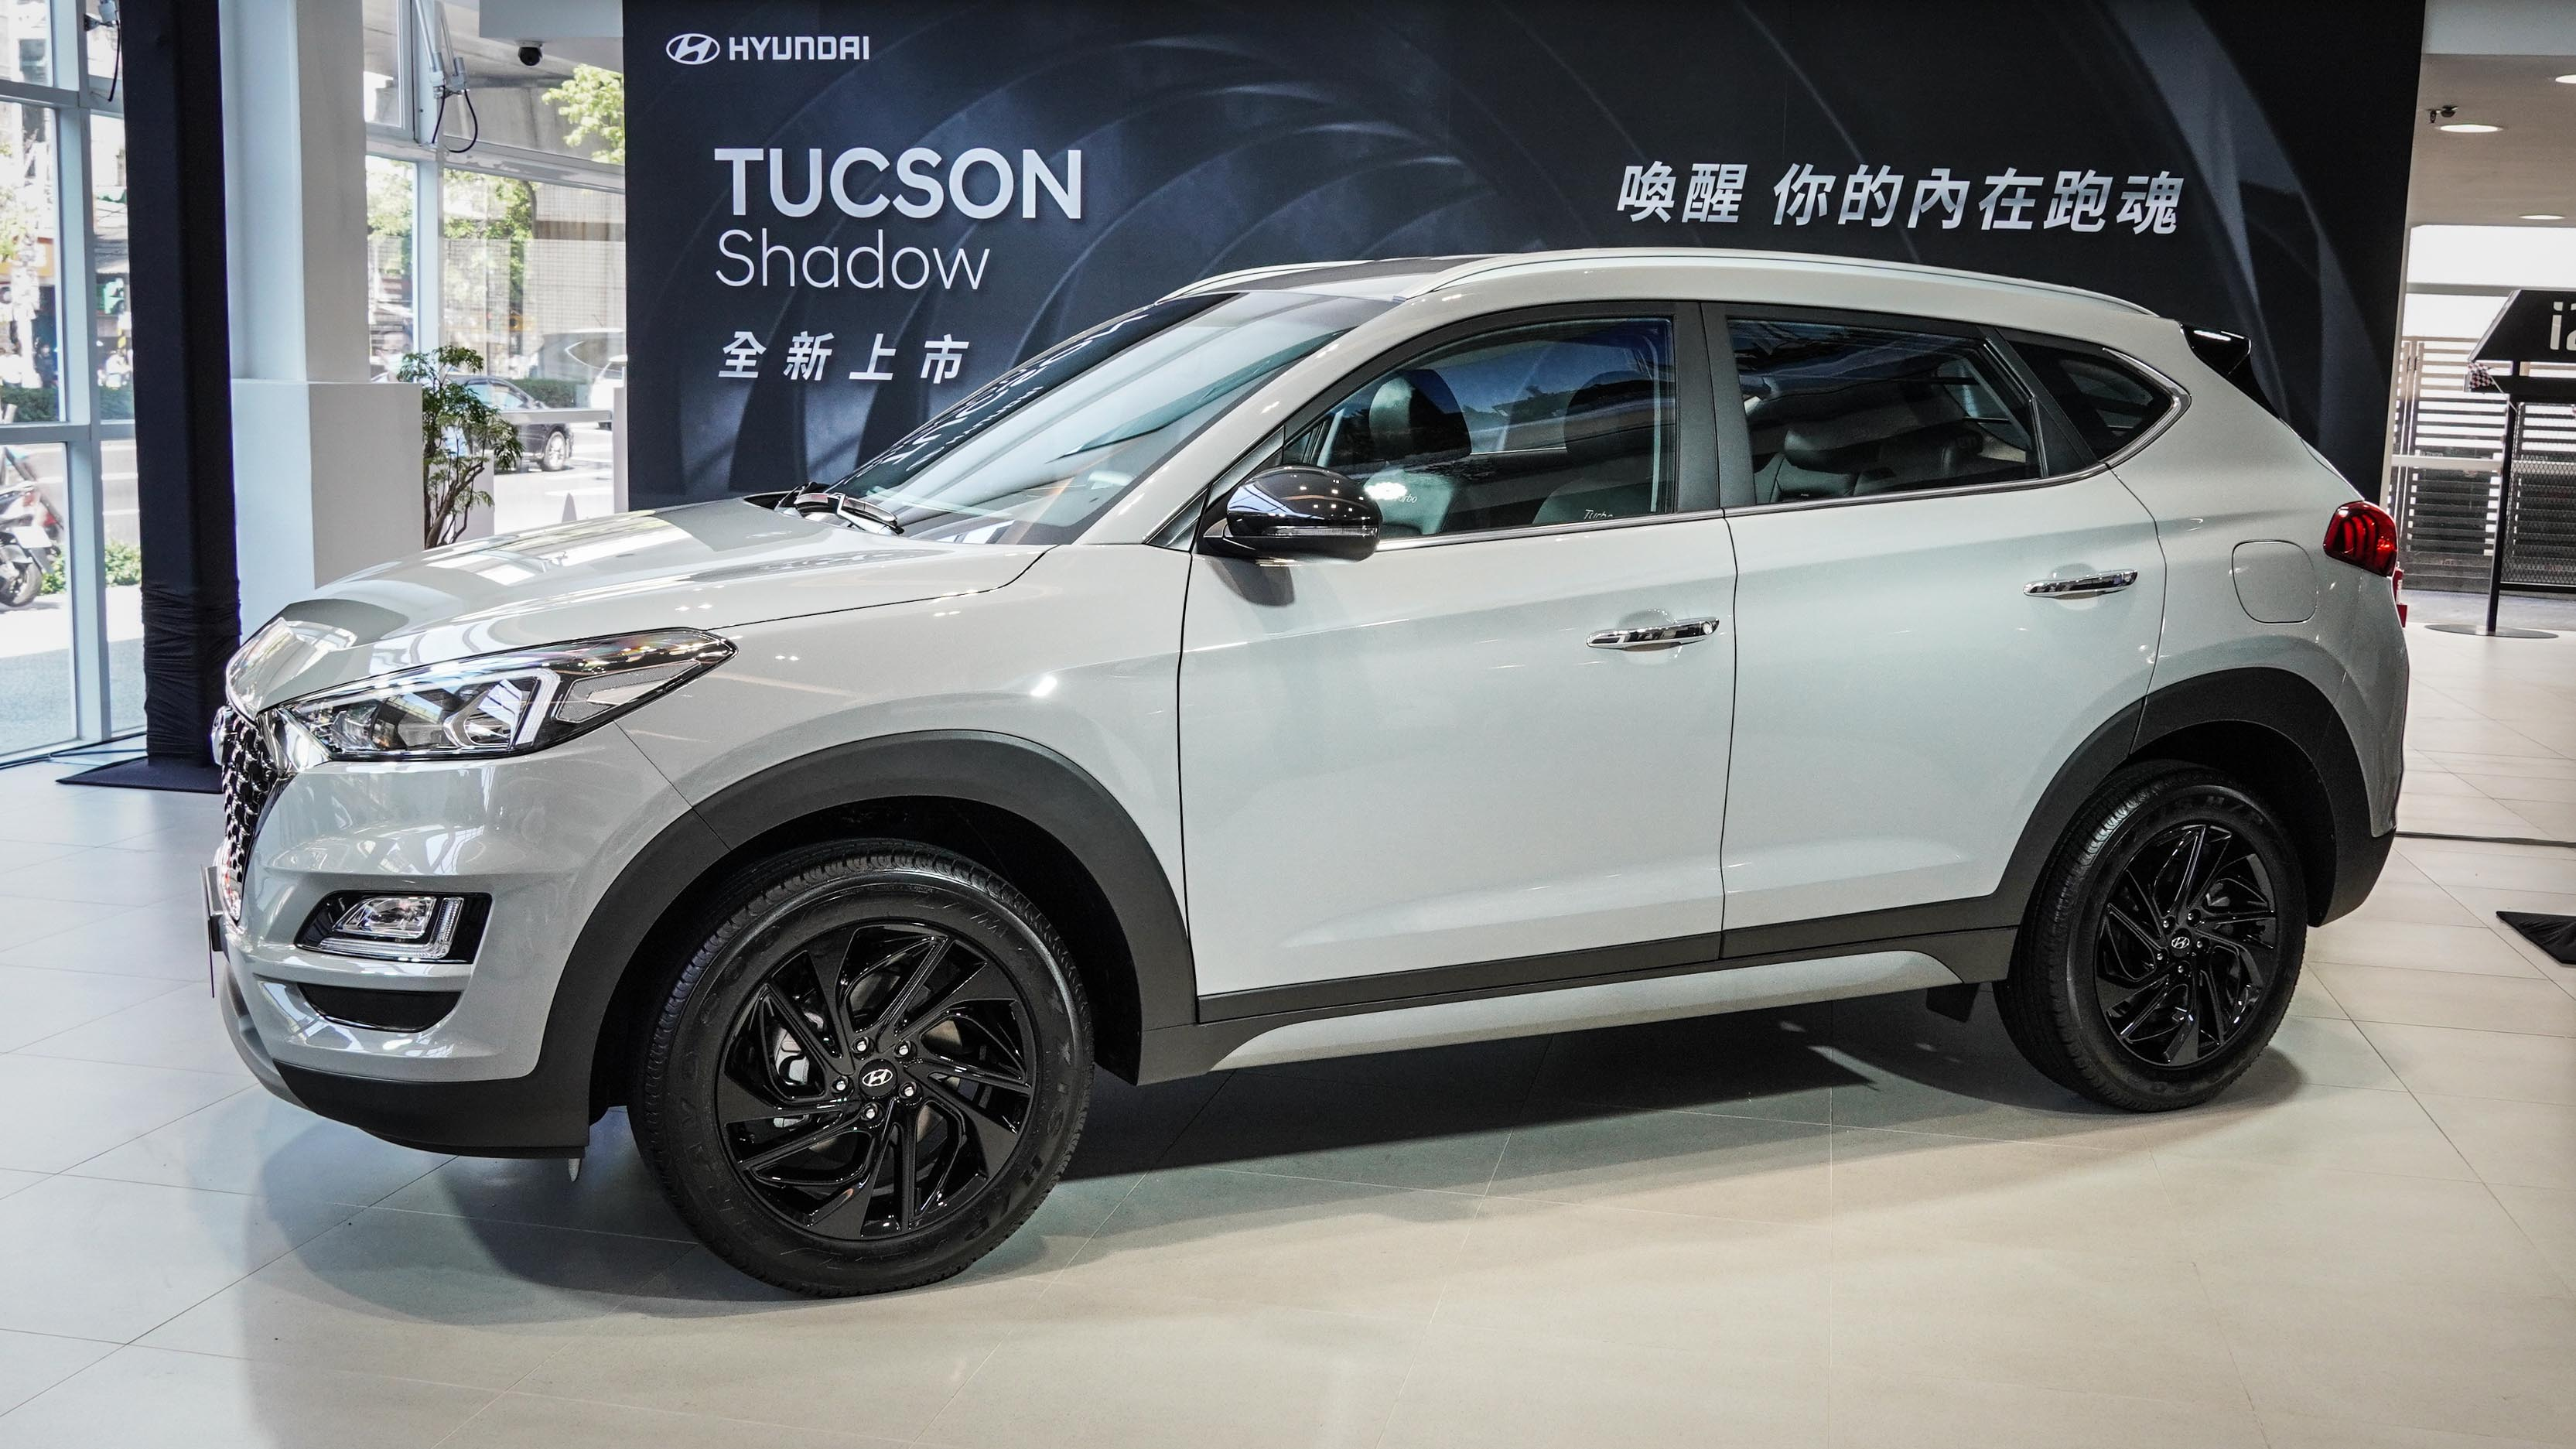 Hyundai Tucson Shadow 96.9 萬限量上市,油電 Kona 預購開跑